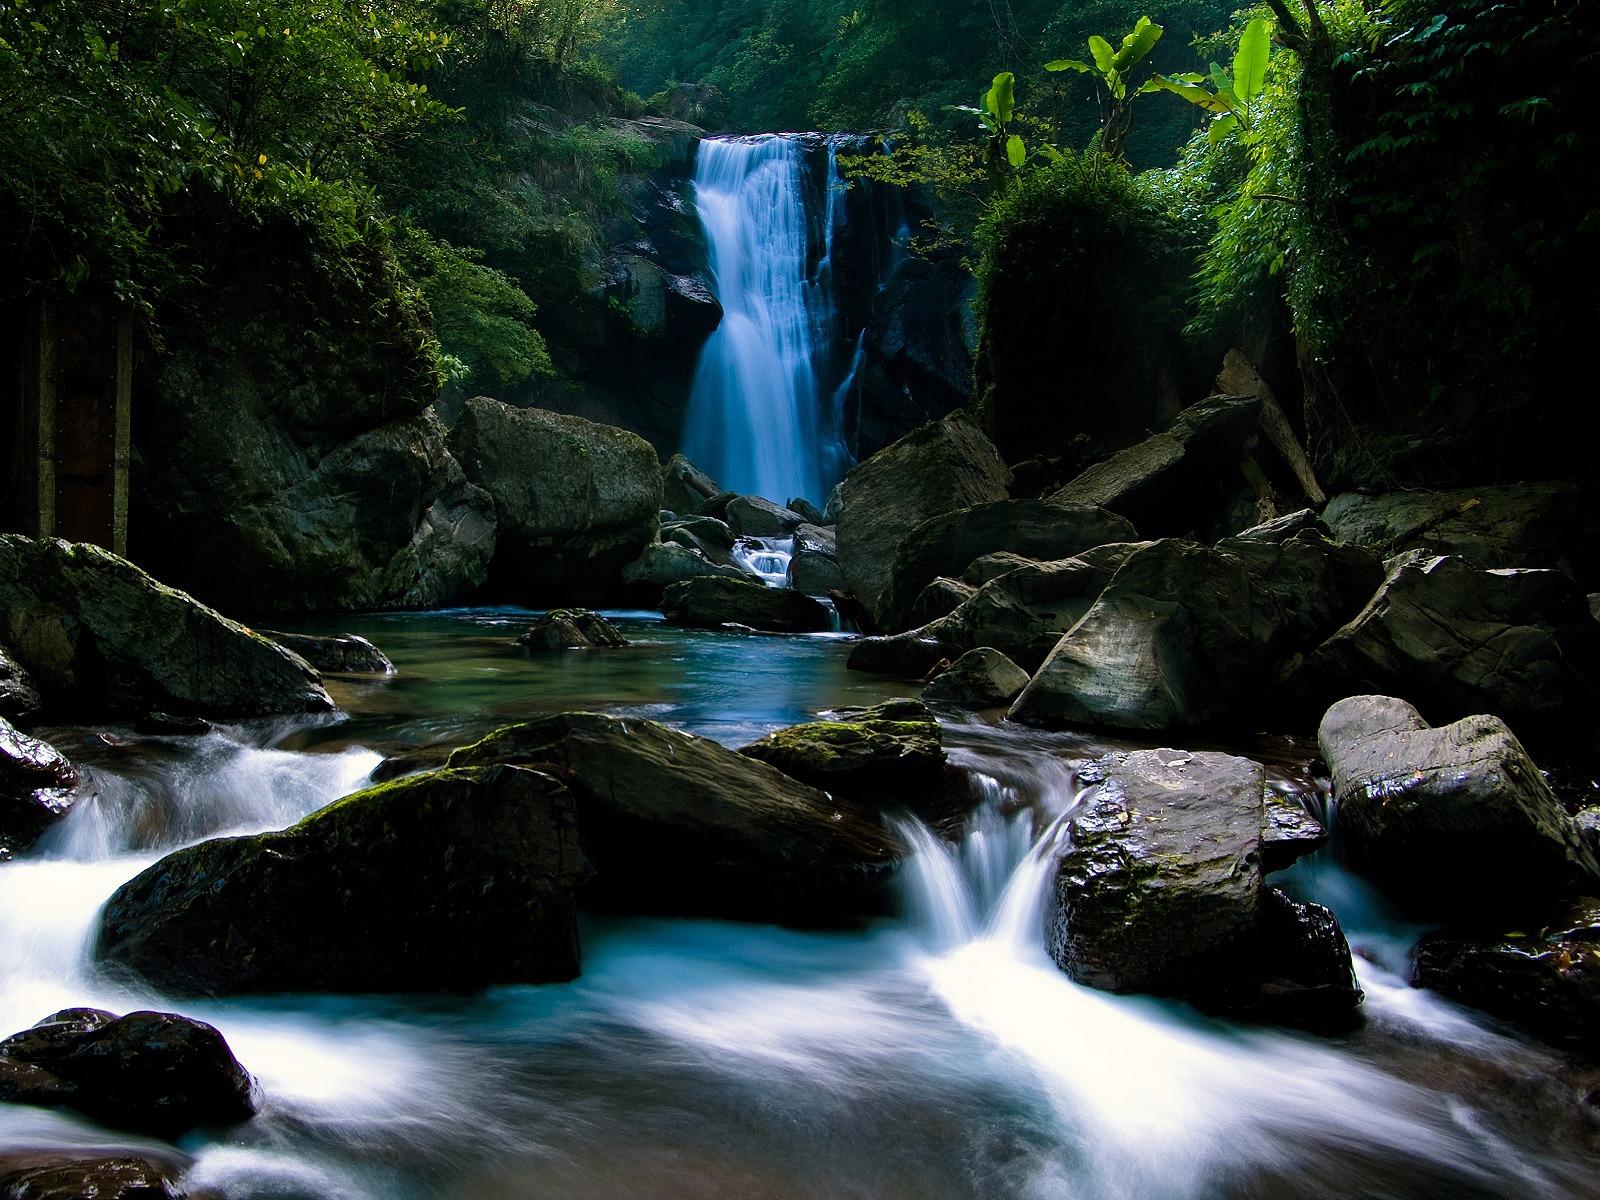 waterfall wallpaper waterfalls nature wallpaper 1600 1200 1402jpg 1600x1200